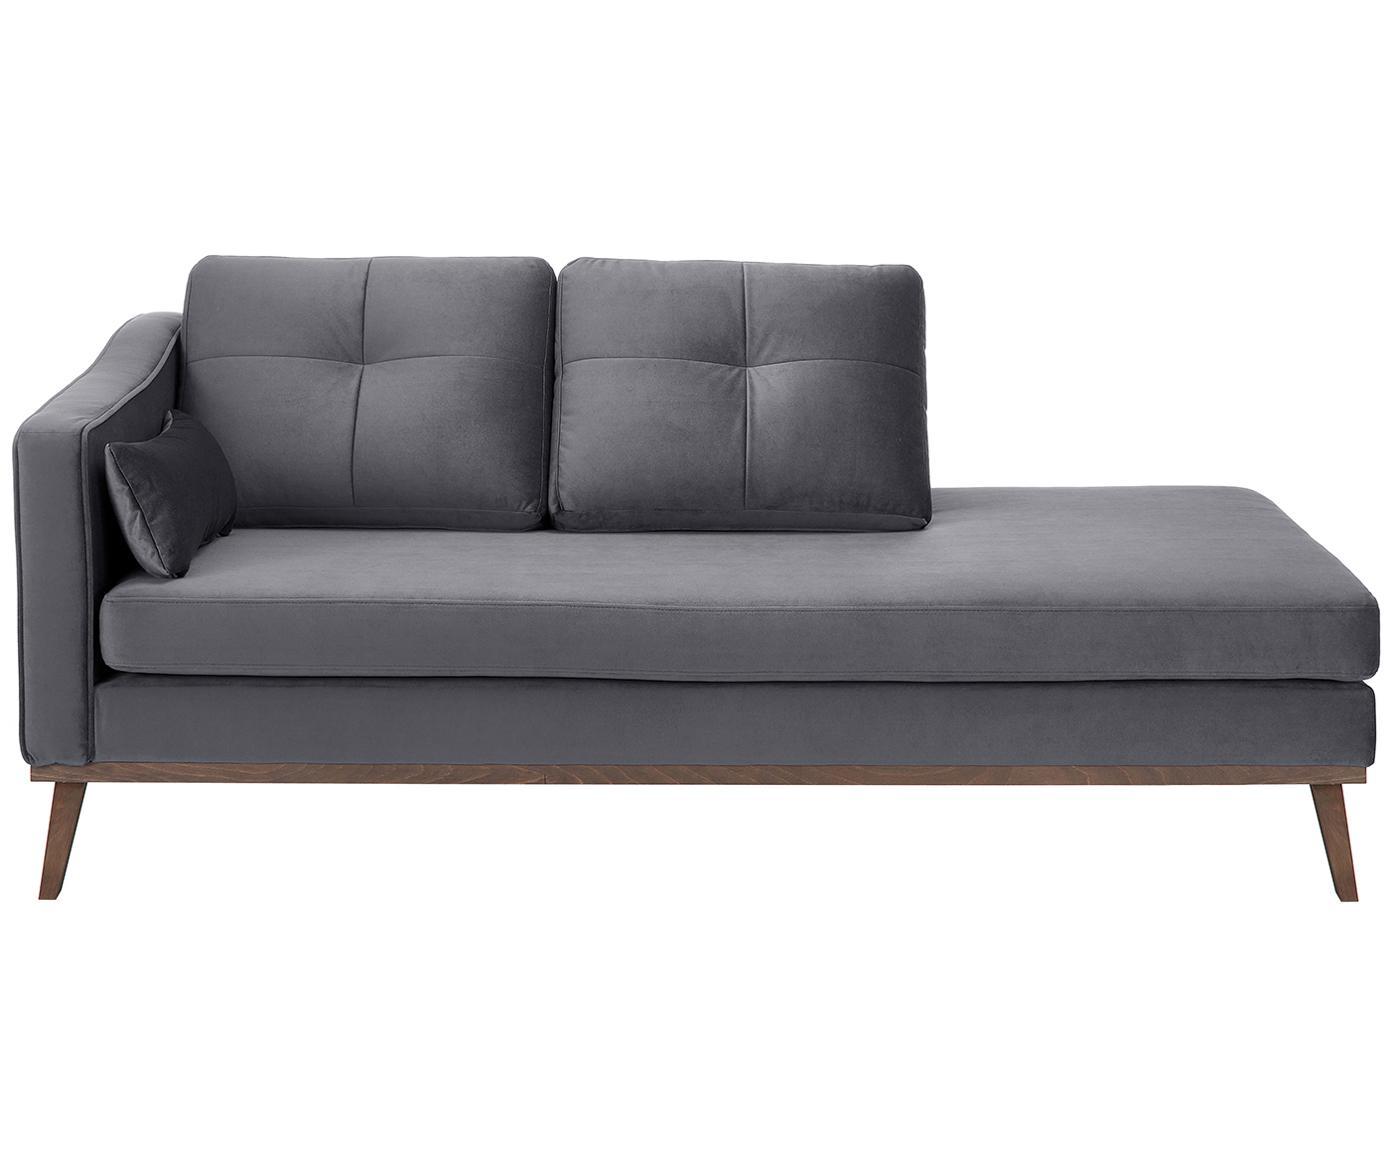 Fluwelen chaise longue Alva, Bekleding: fluweel (hoogwaardig poly, Frame: massief grenenhout, Poten: massief gebeitst beukenho, Donkergrijs, B 193 x D 94 cm